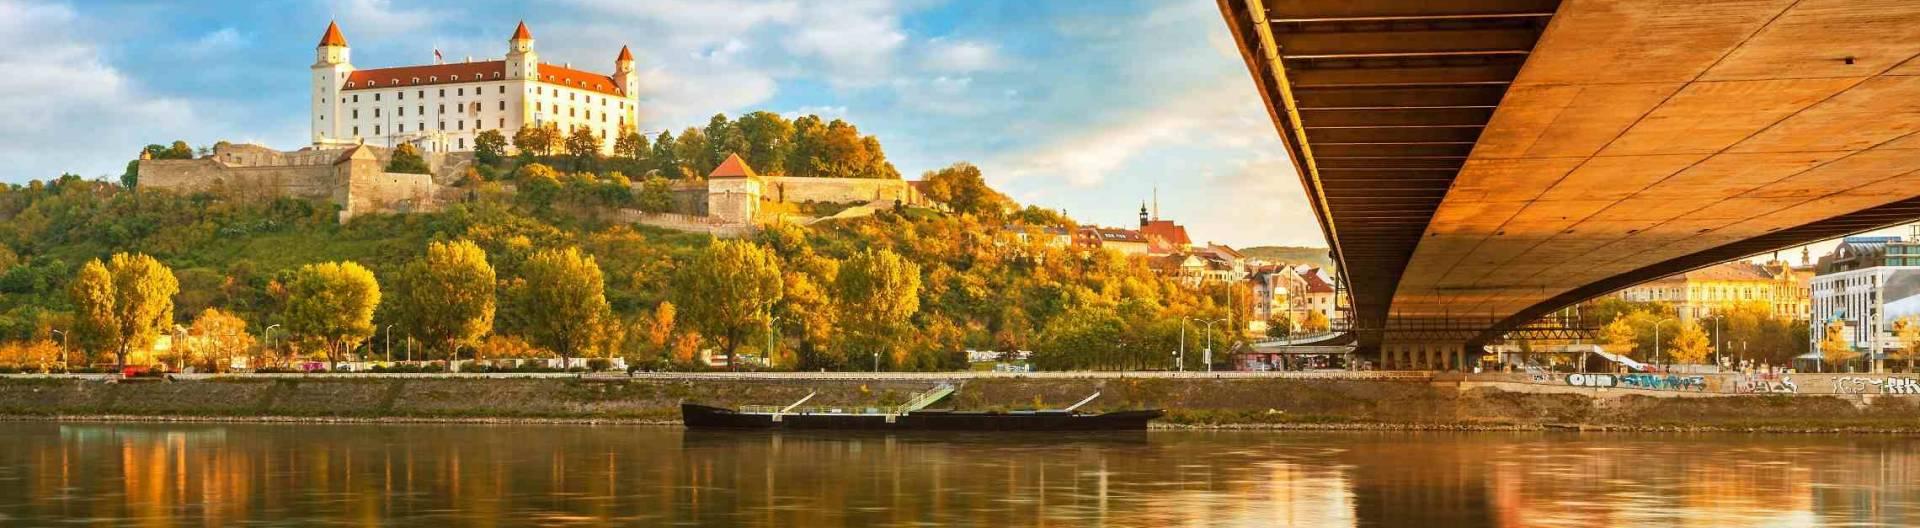 Bratislavan-linna-Slovakia-Tonavan-risteily-1920x528.jpg